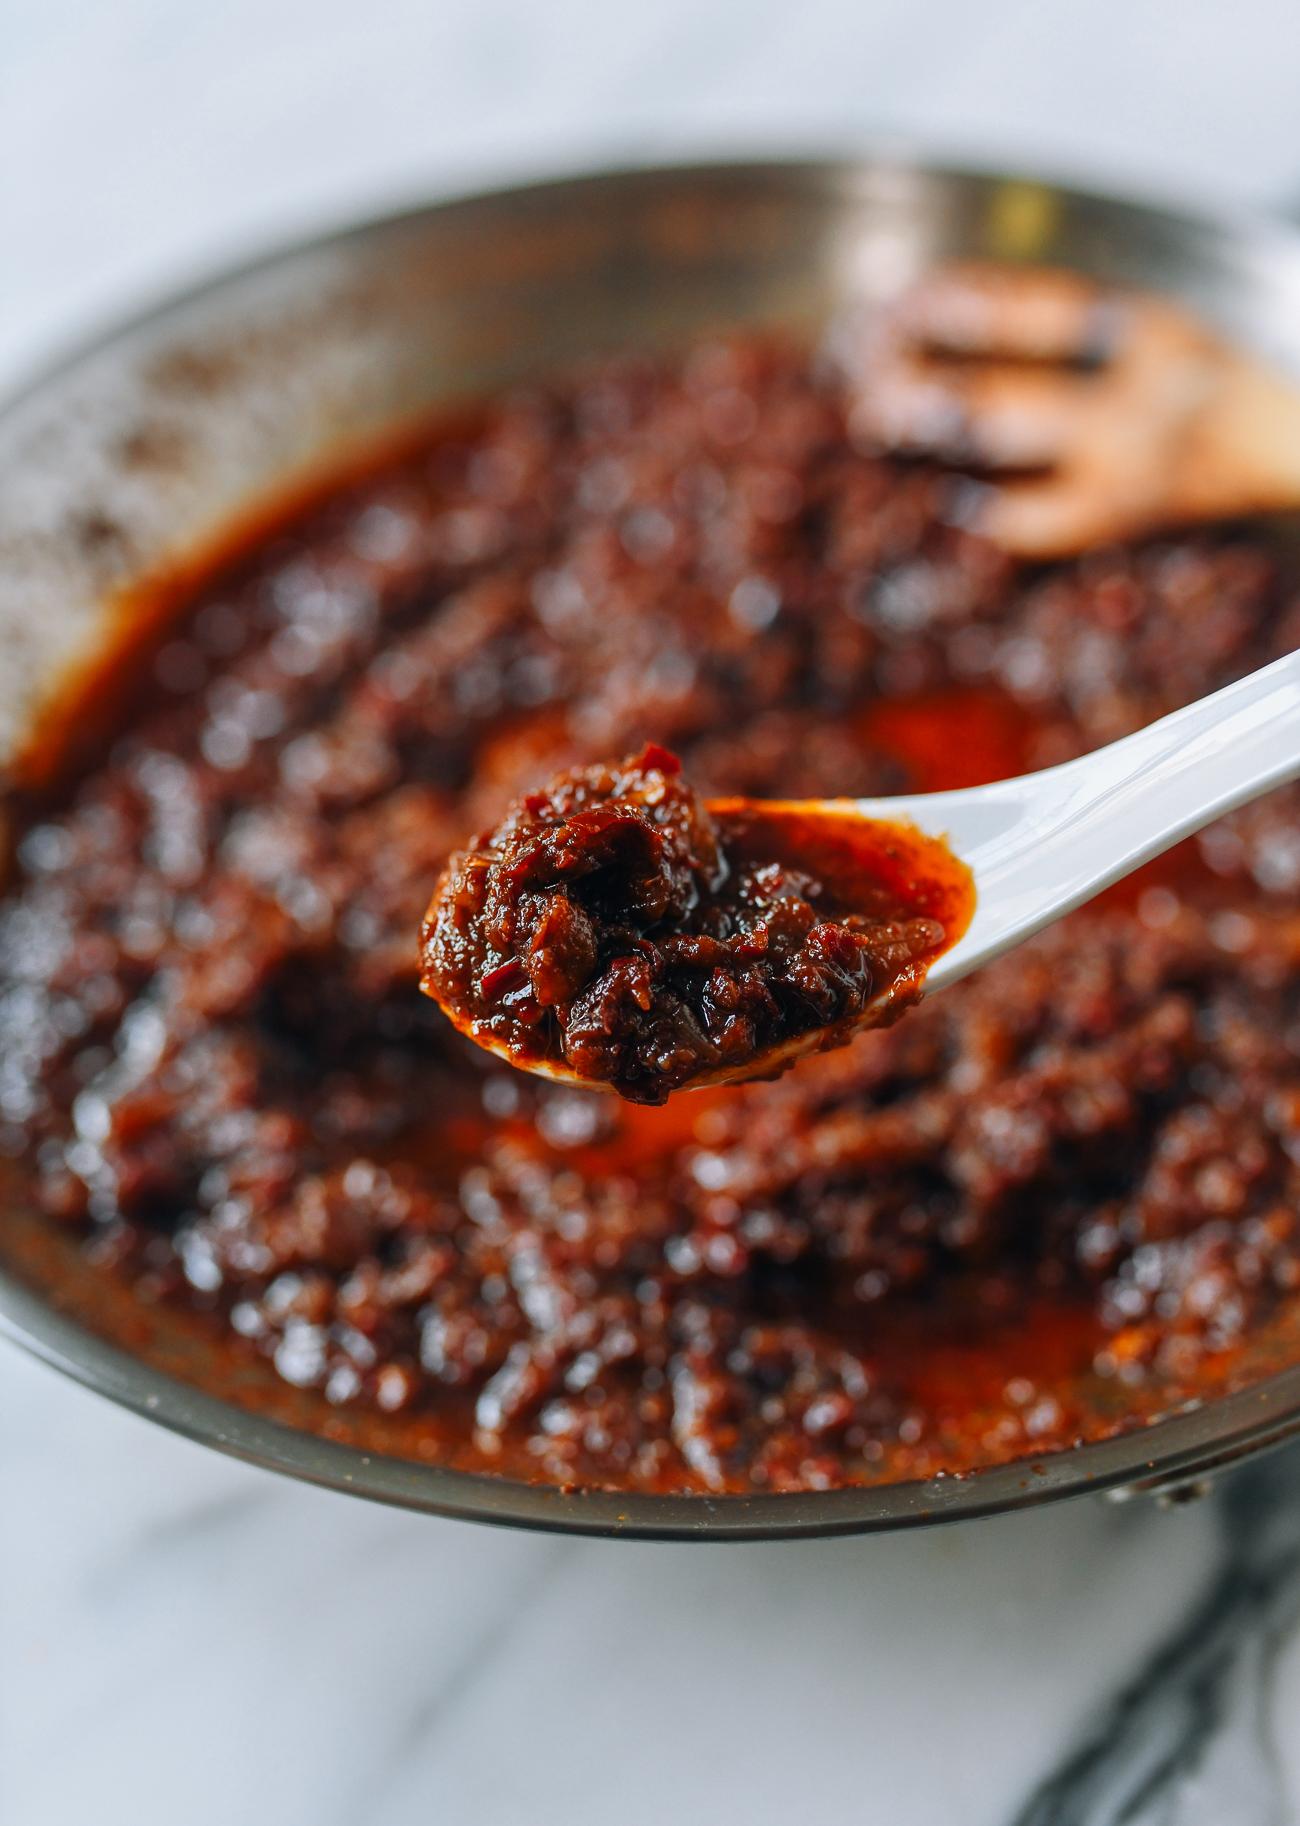 Spoonful of Malaysian Chinese Belacan Sauce (Ma Lai Zan)